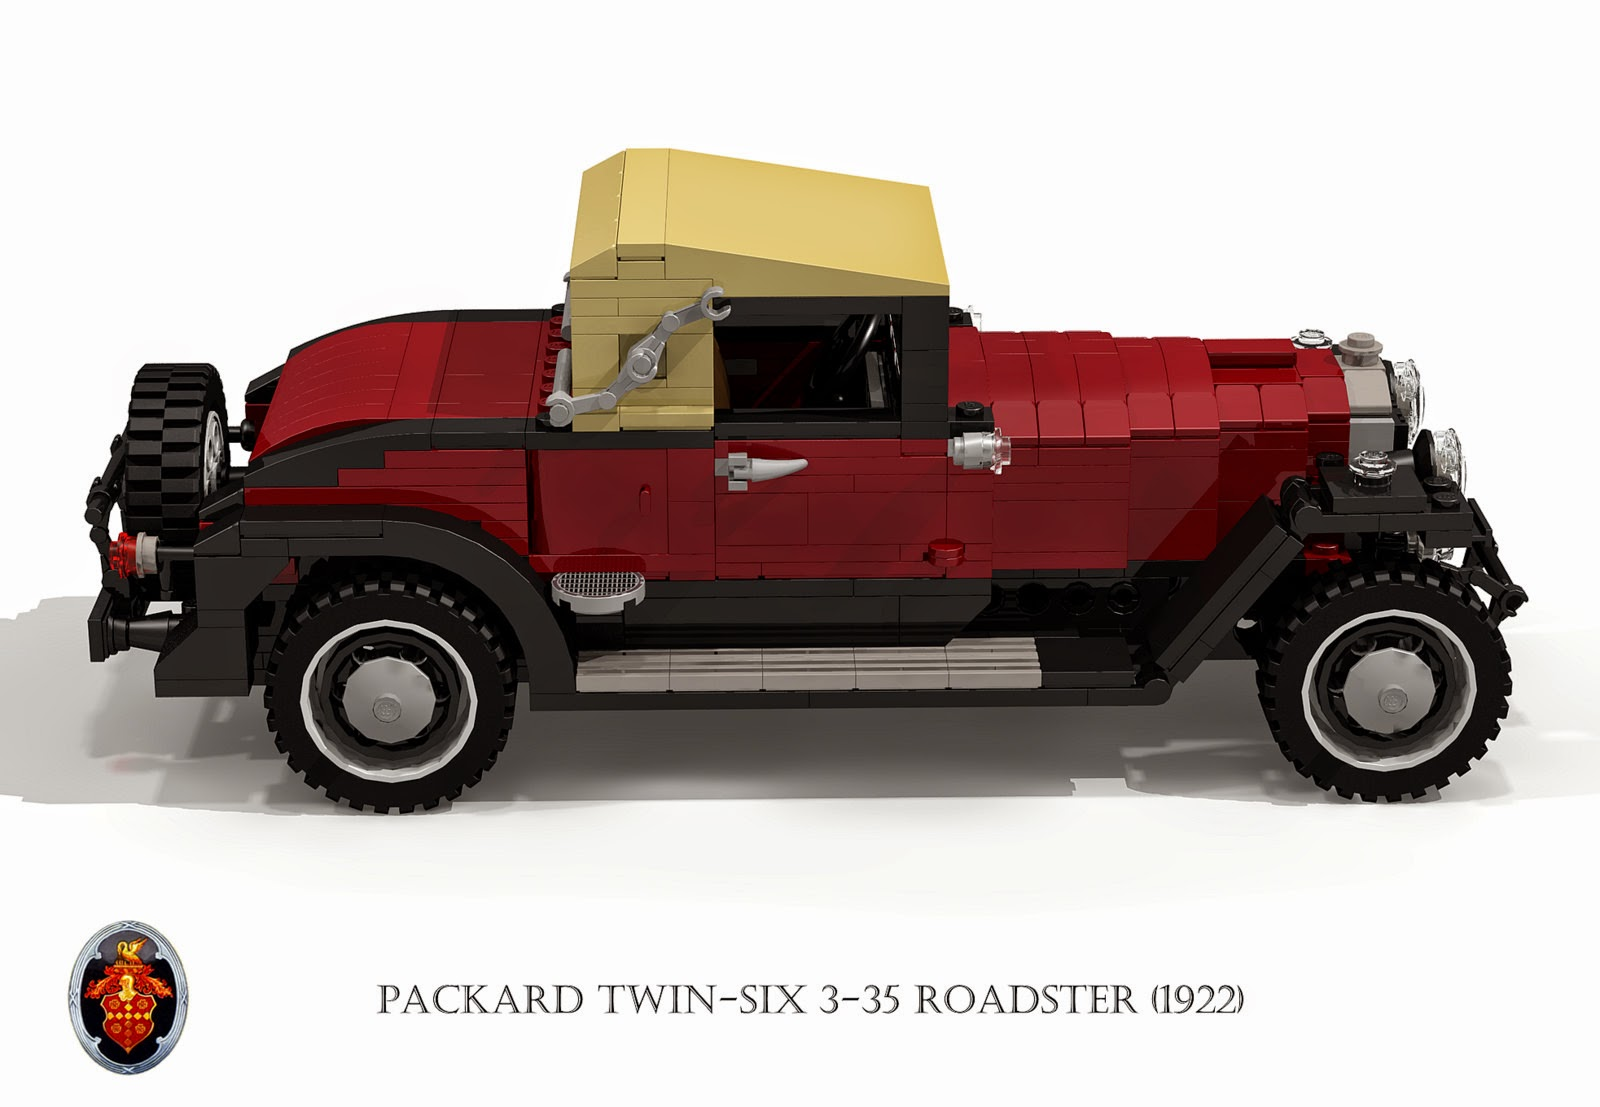 LEGO Block Block: Peter Blackert (lego911)